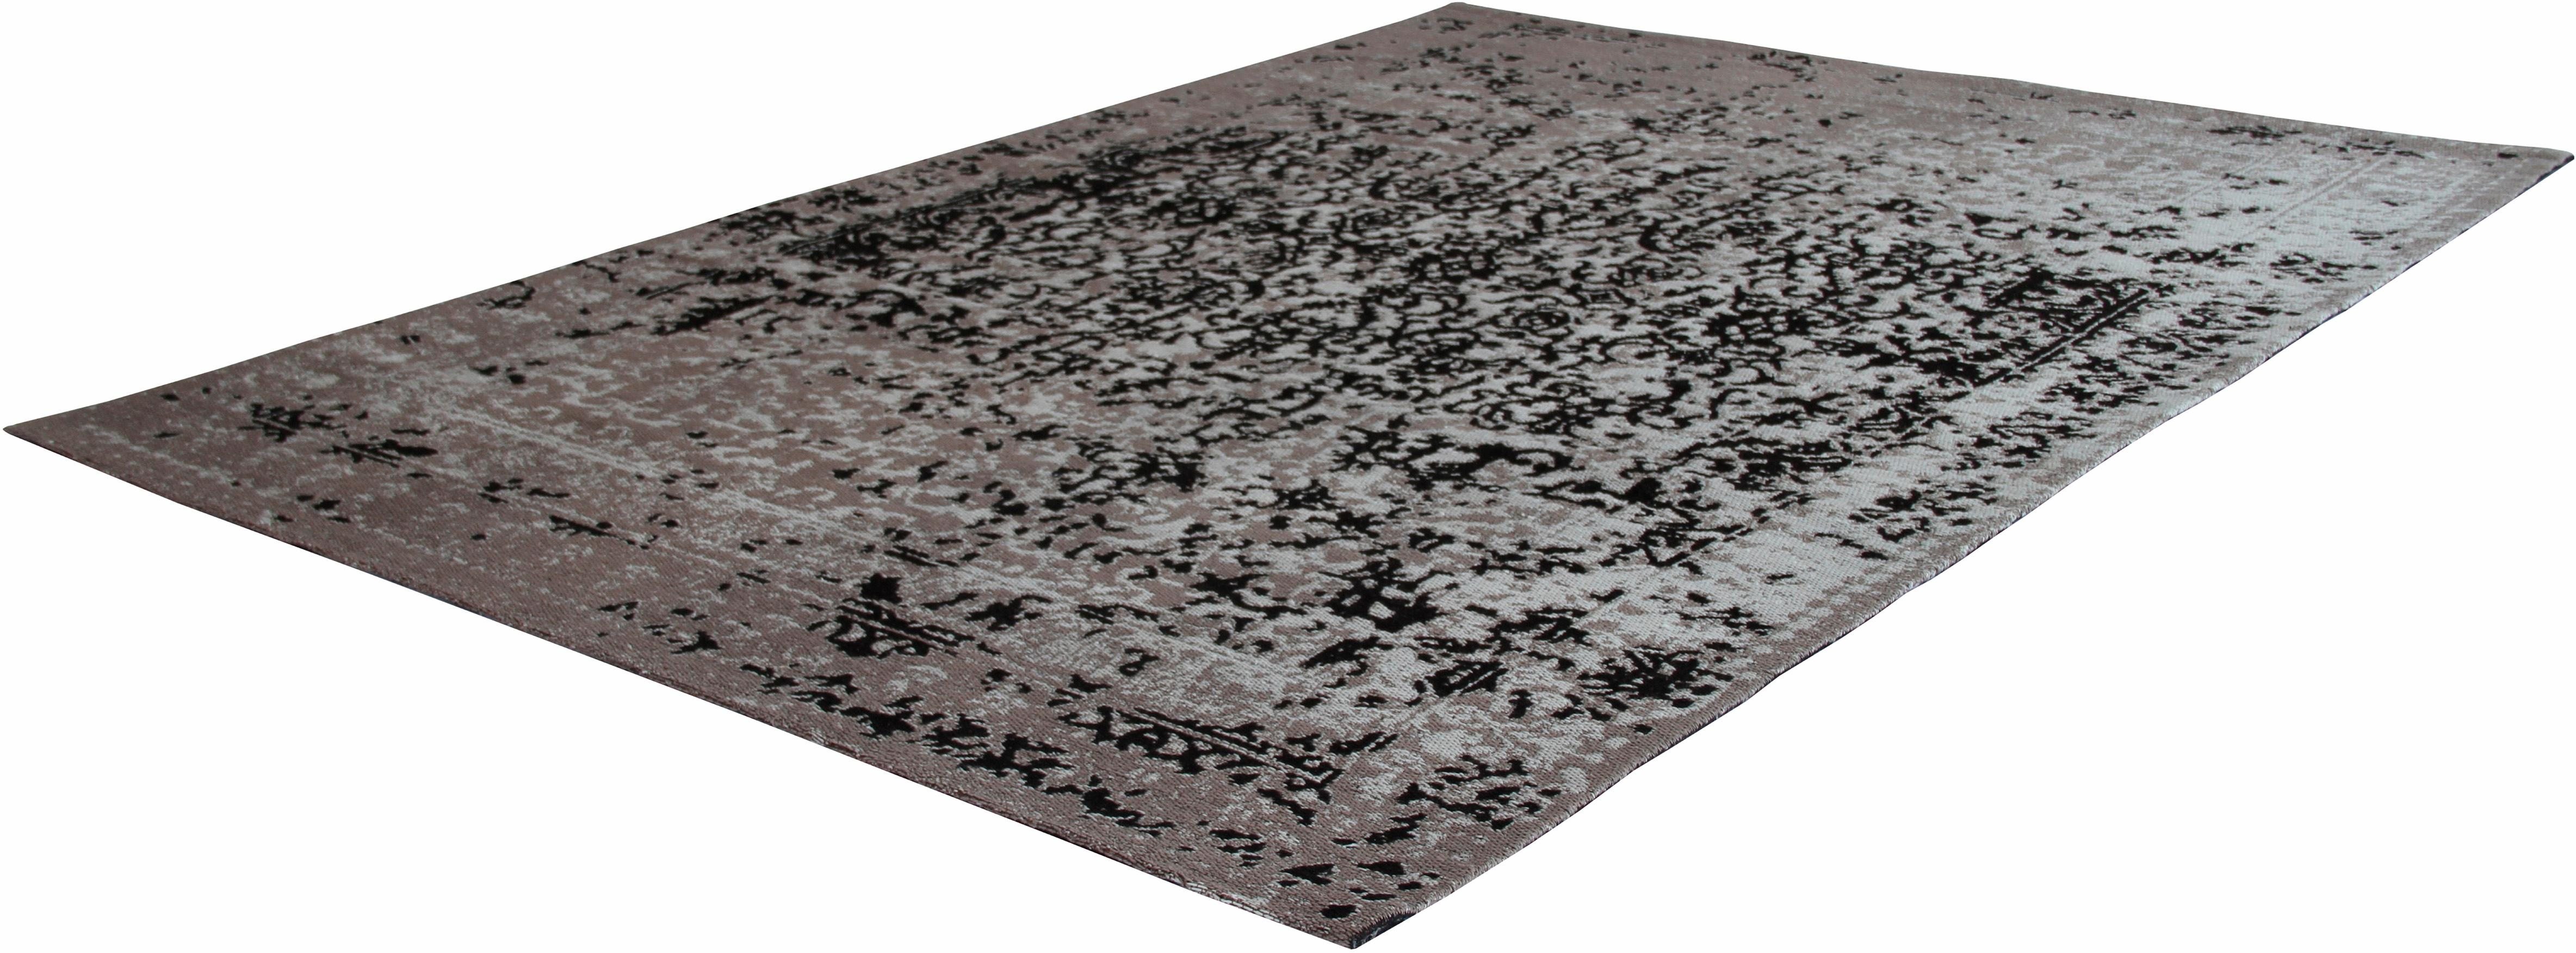 Teppich Sunny 310 Kayoom rechteckig Höhe 5 mm handgewebt